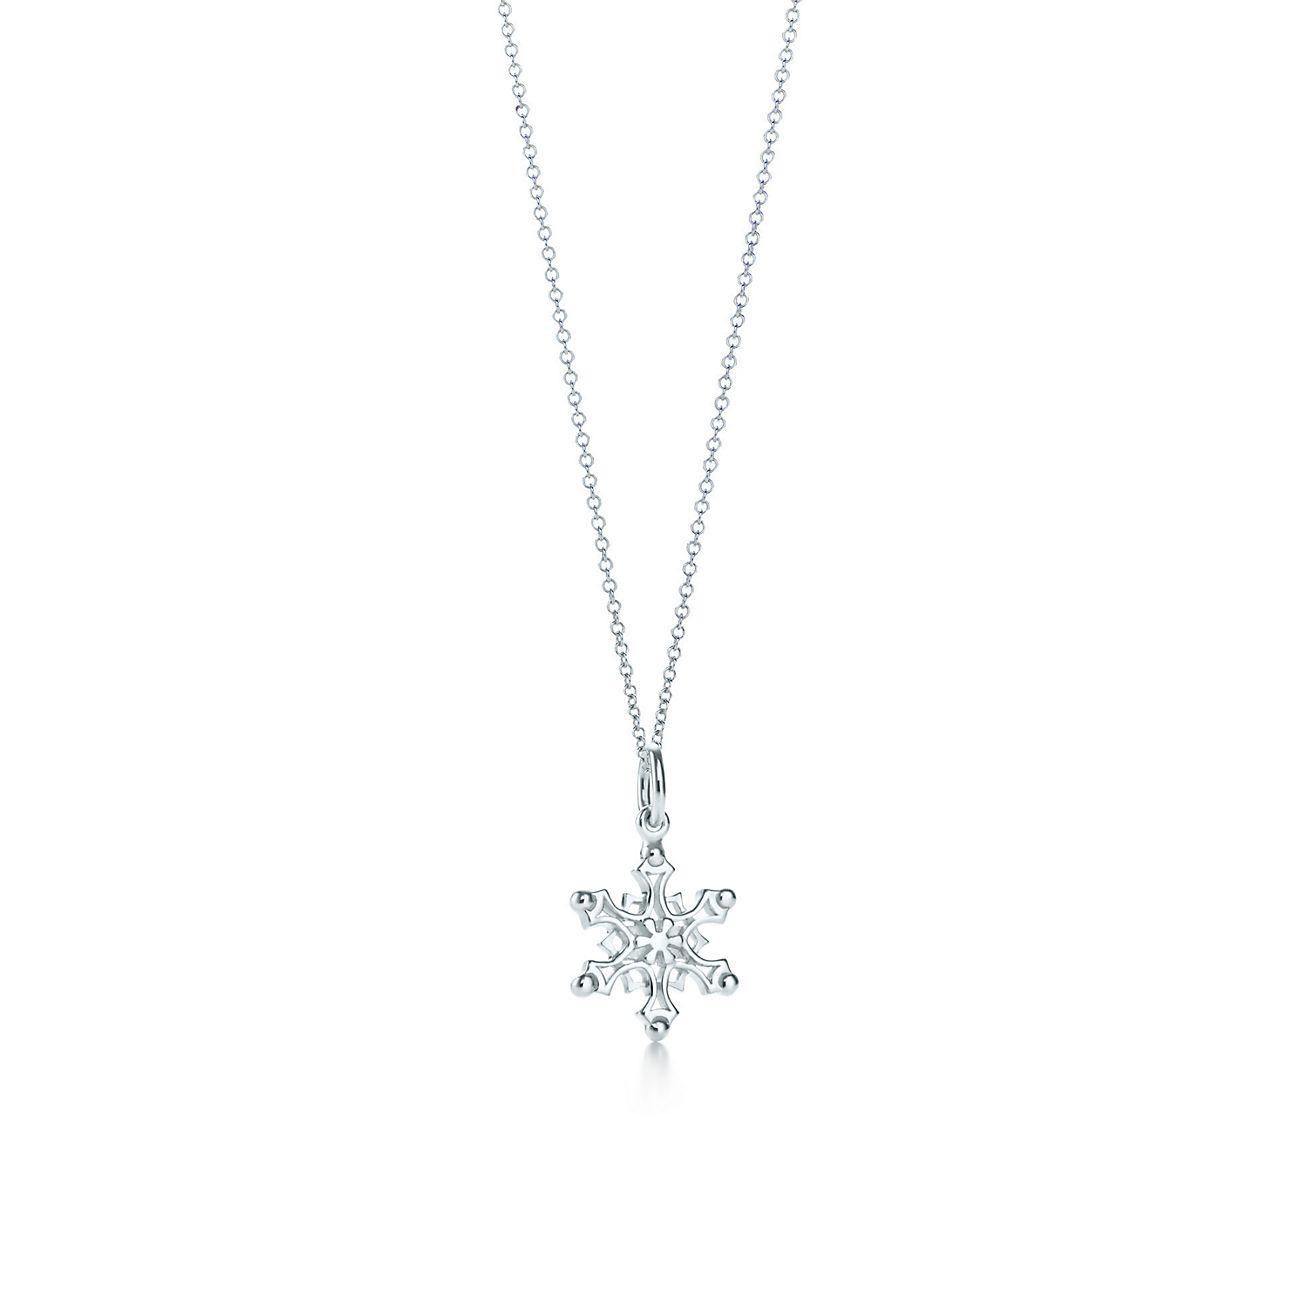 cbd096c73cf5f Tiffany Co Snowflake Earrings - Best All Earring Photos Kamilmaciol.Com